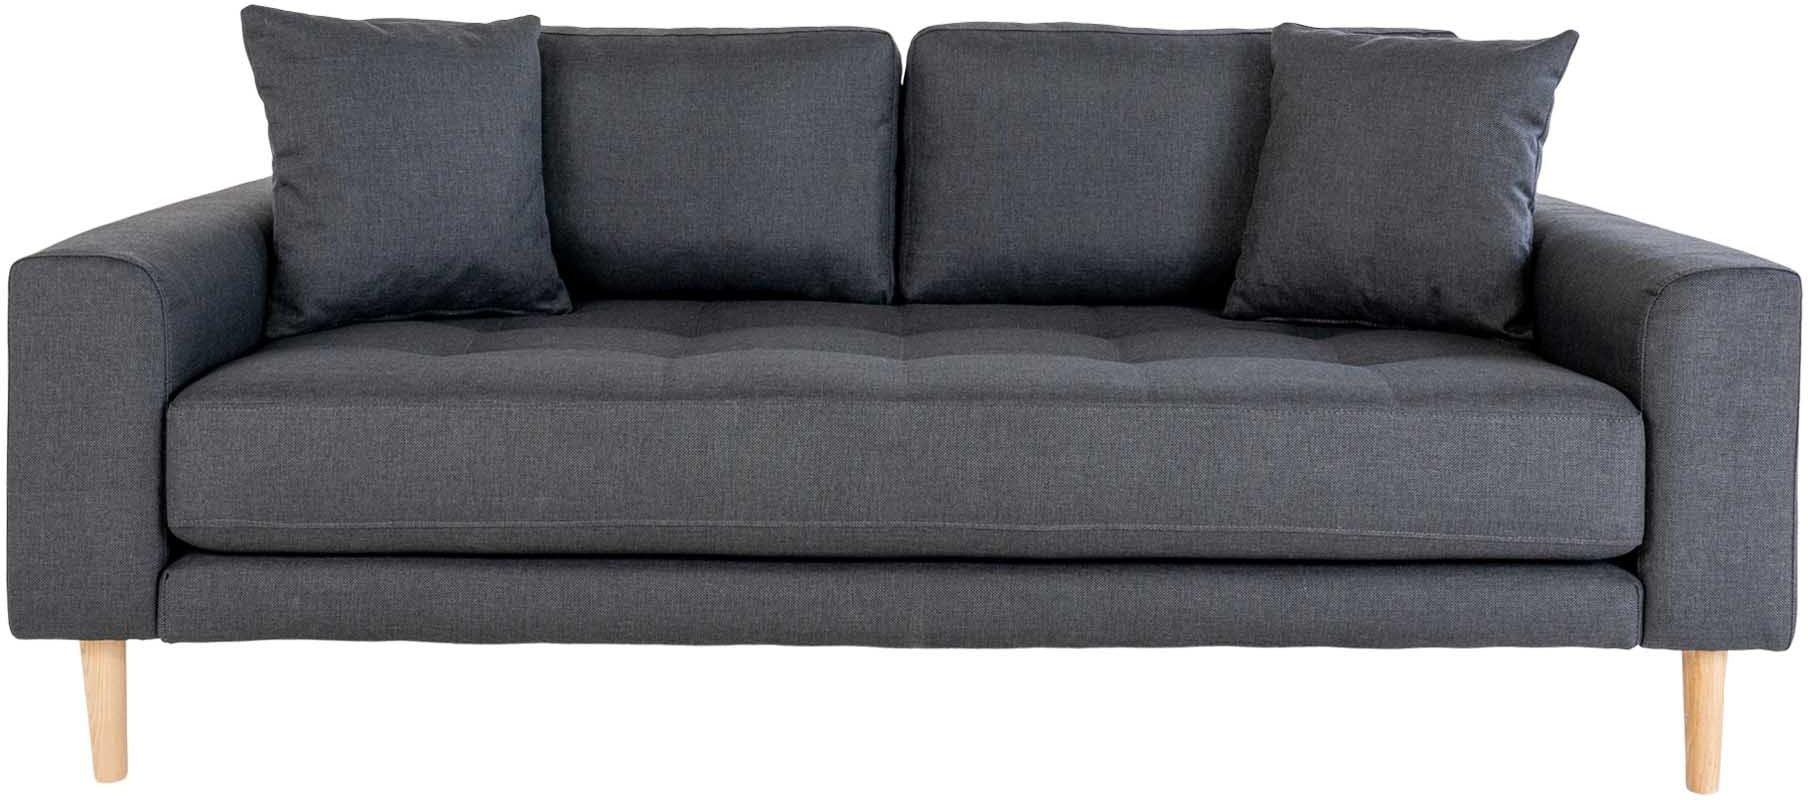 Lido, 2,5-personers sofa, Stof by Nordby (H: 76 cm. B: 180 cm. L: 93 cm., Mørkegrå)